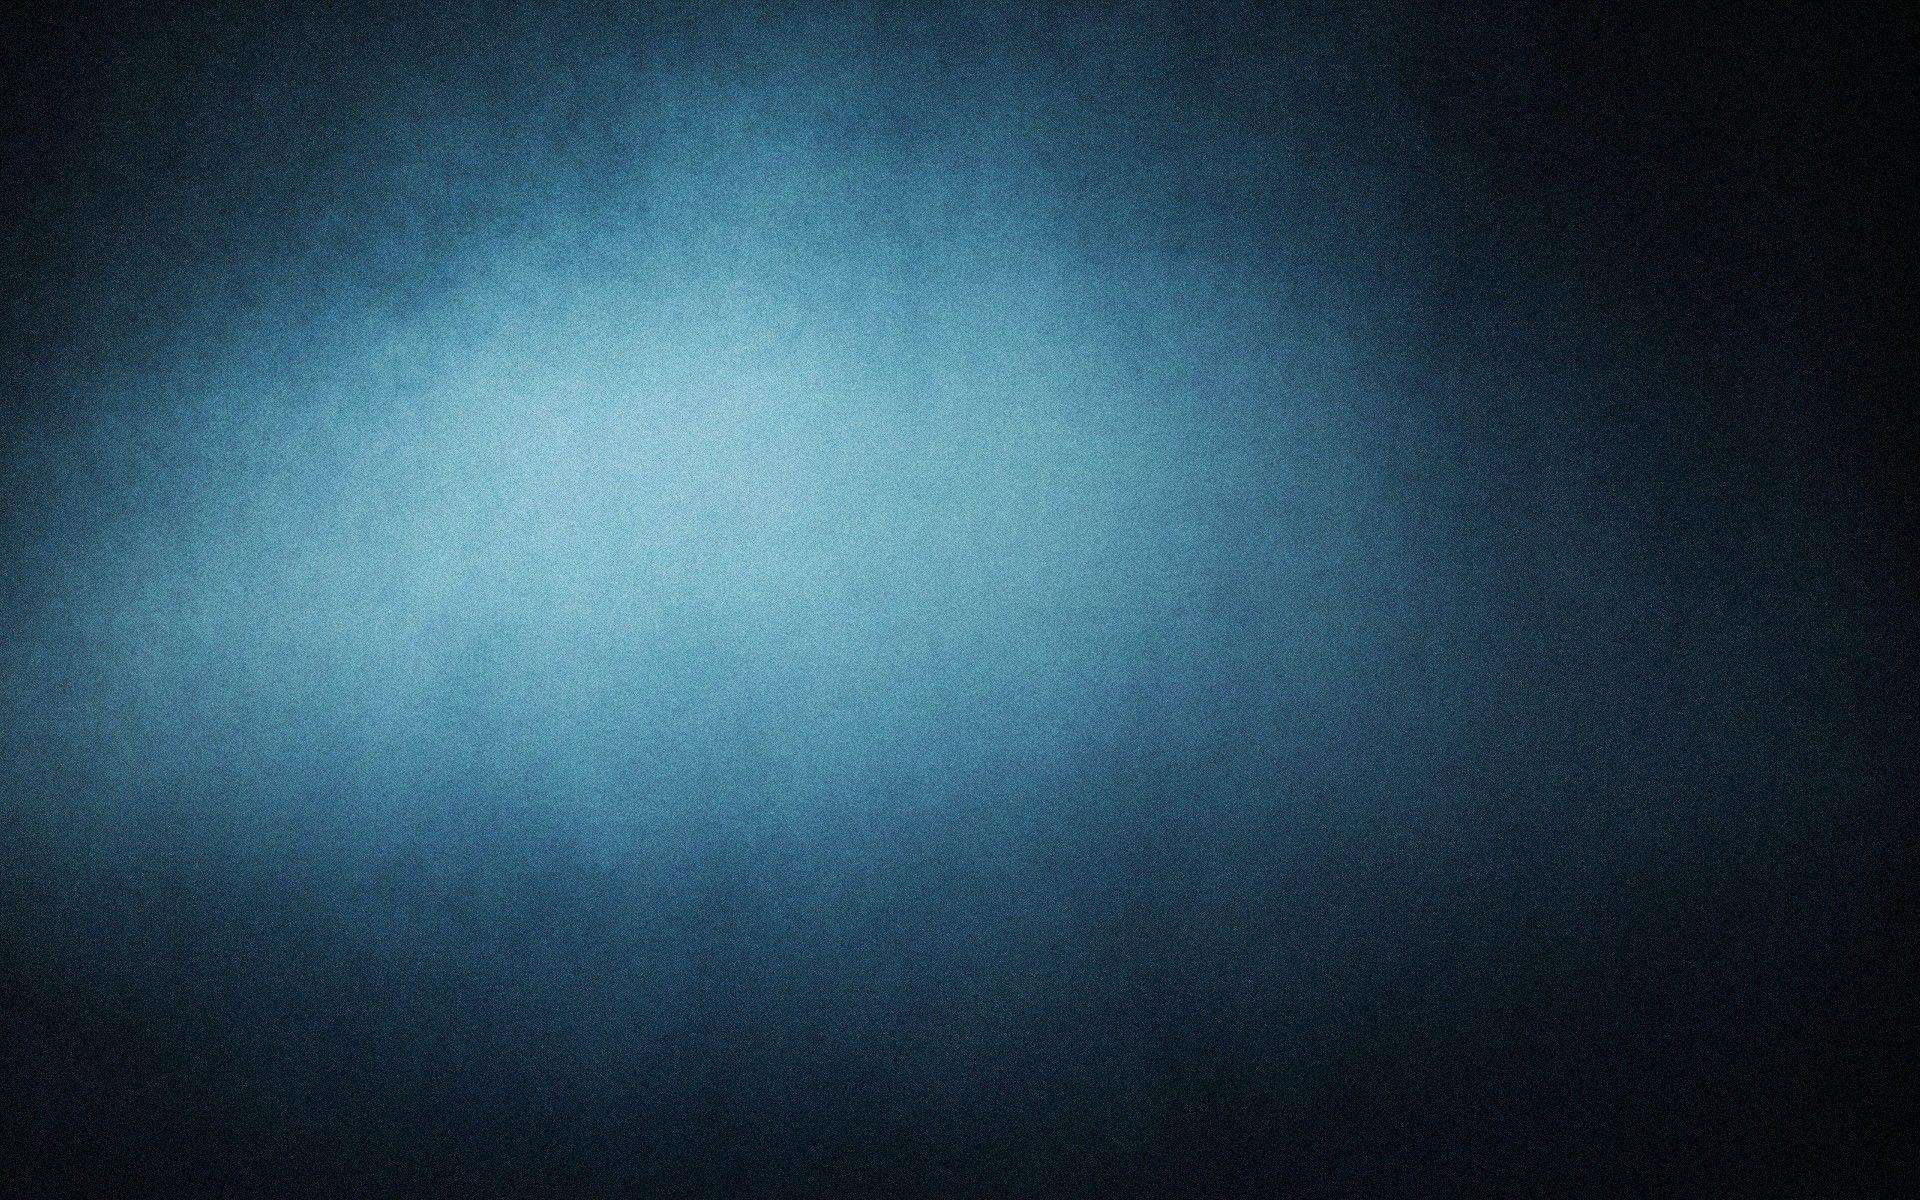 texture, digital art, minimalism, abstract, blue,